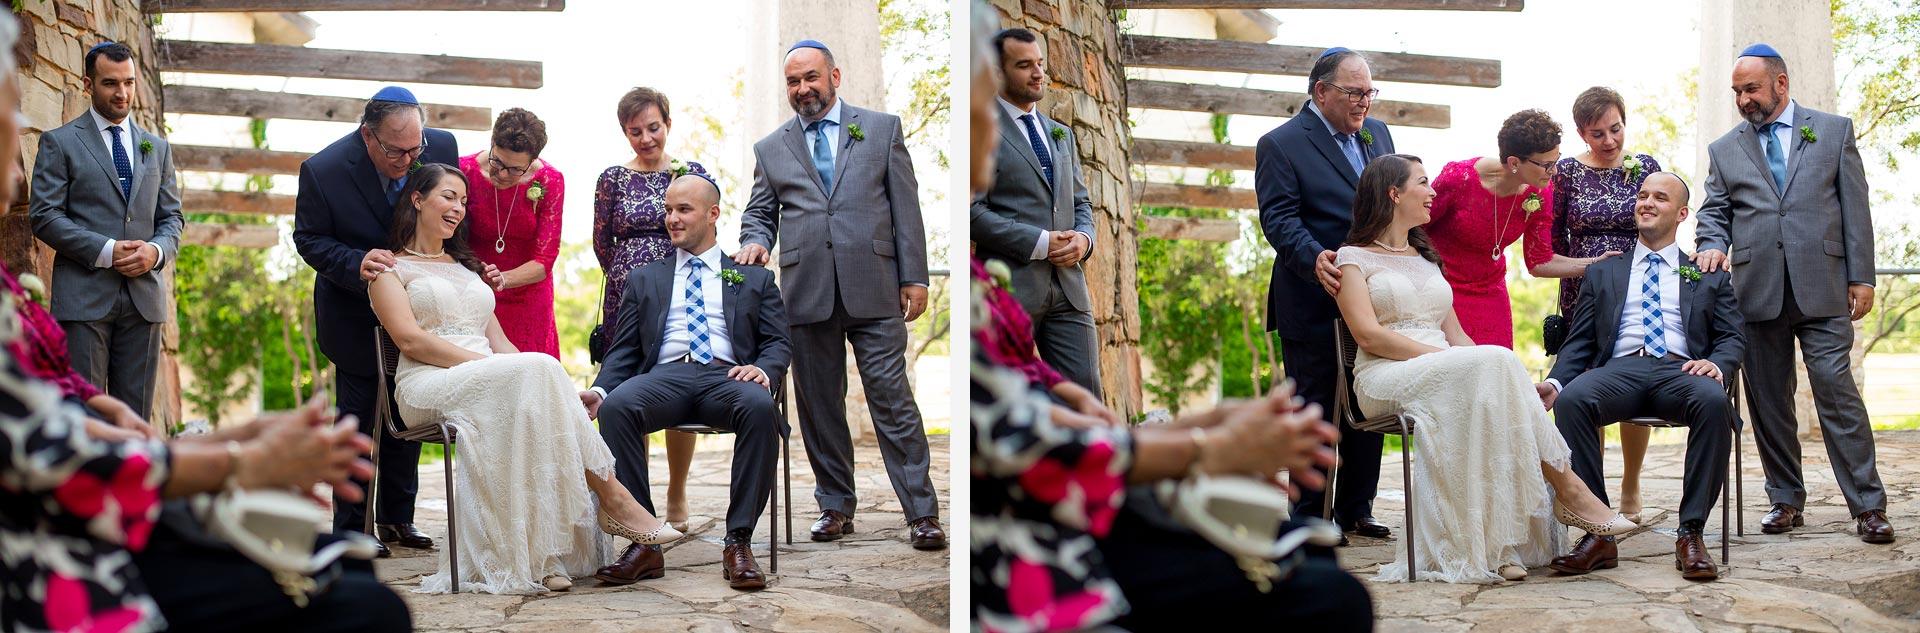 Austin Jewish Wedding Photography